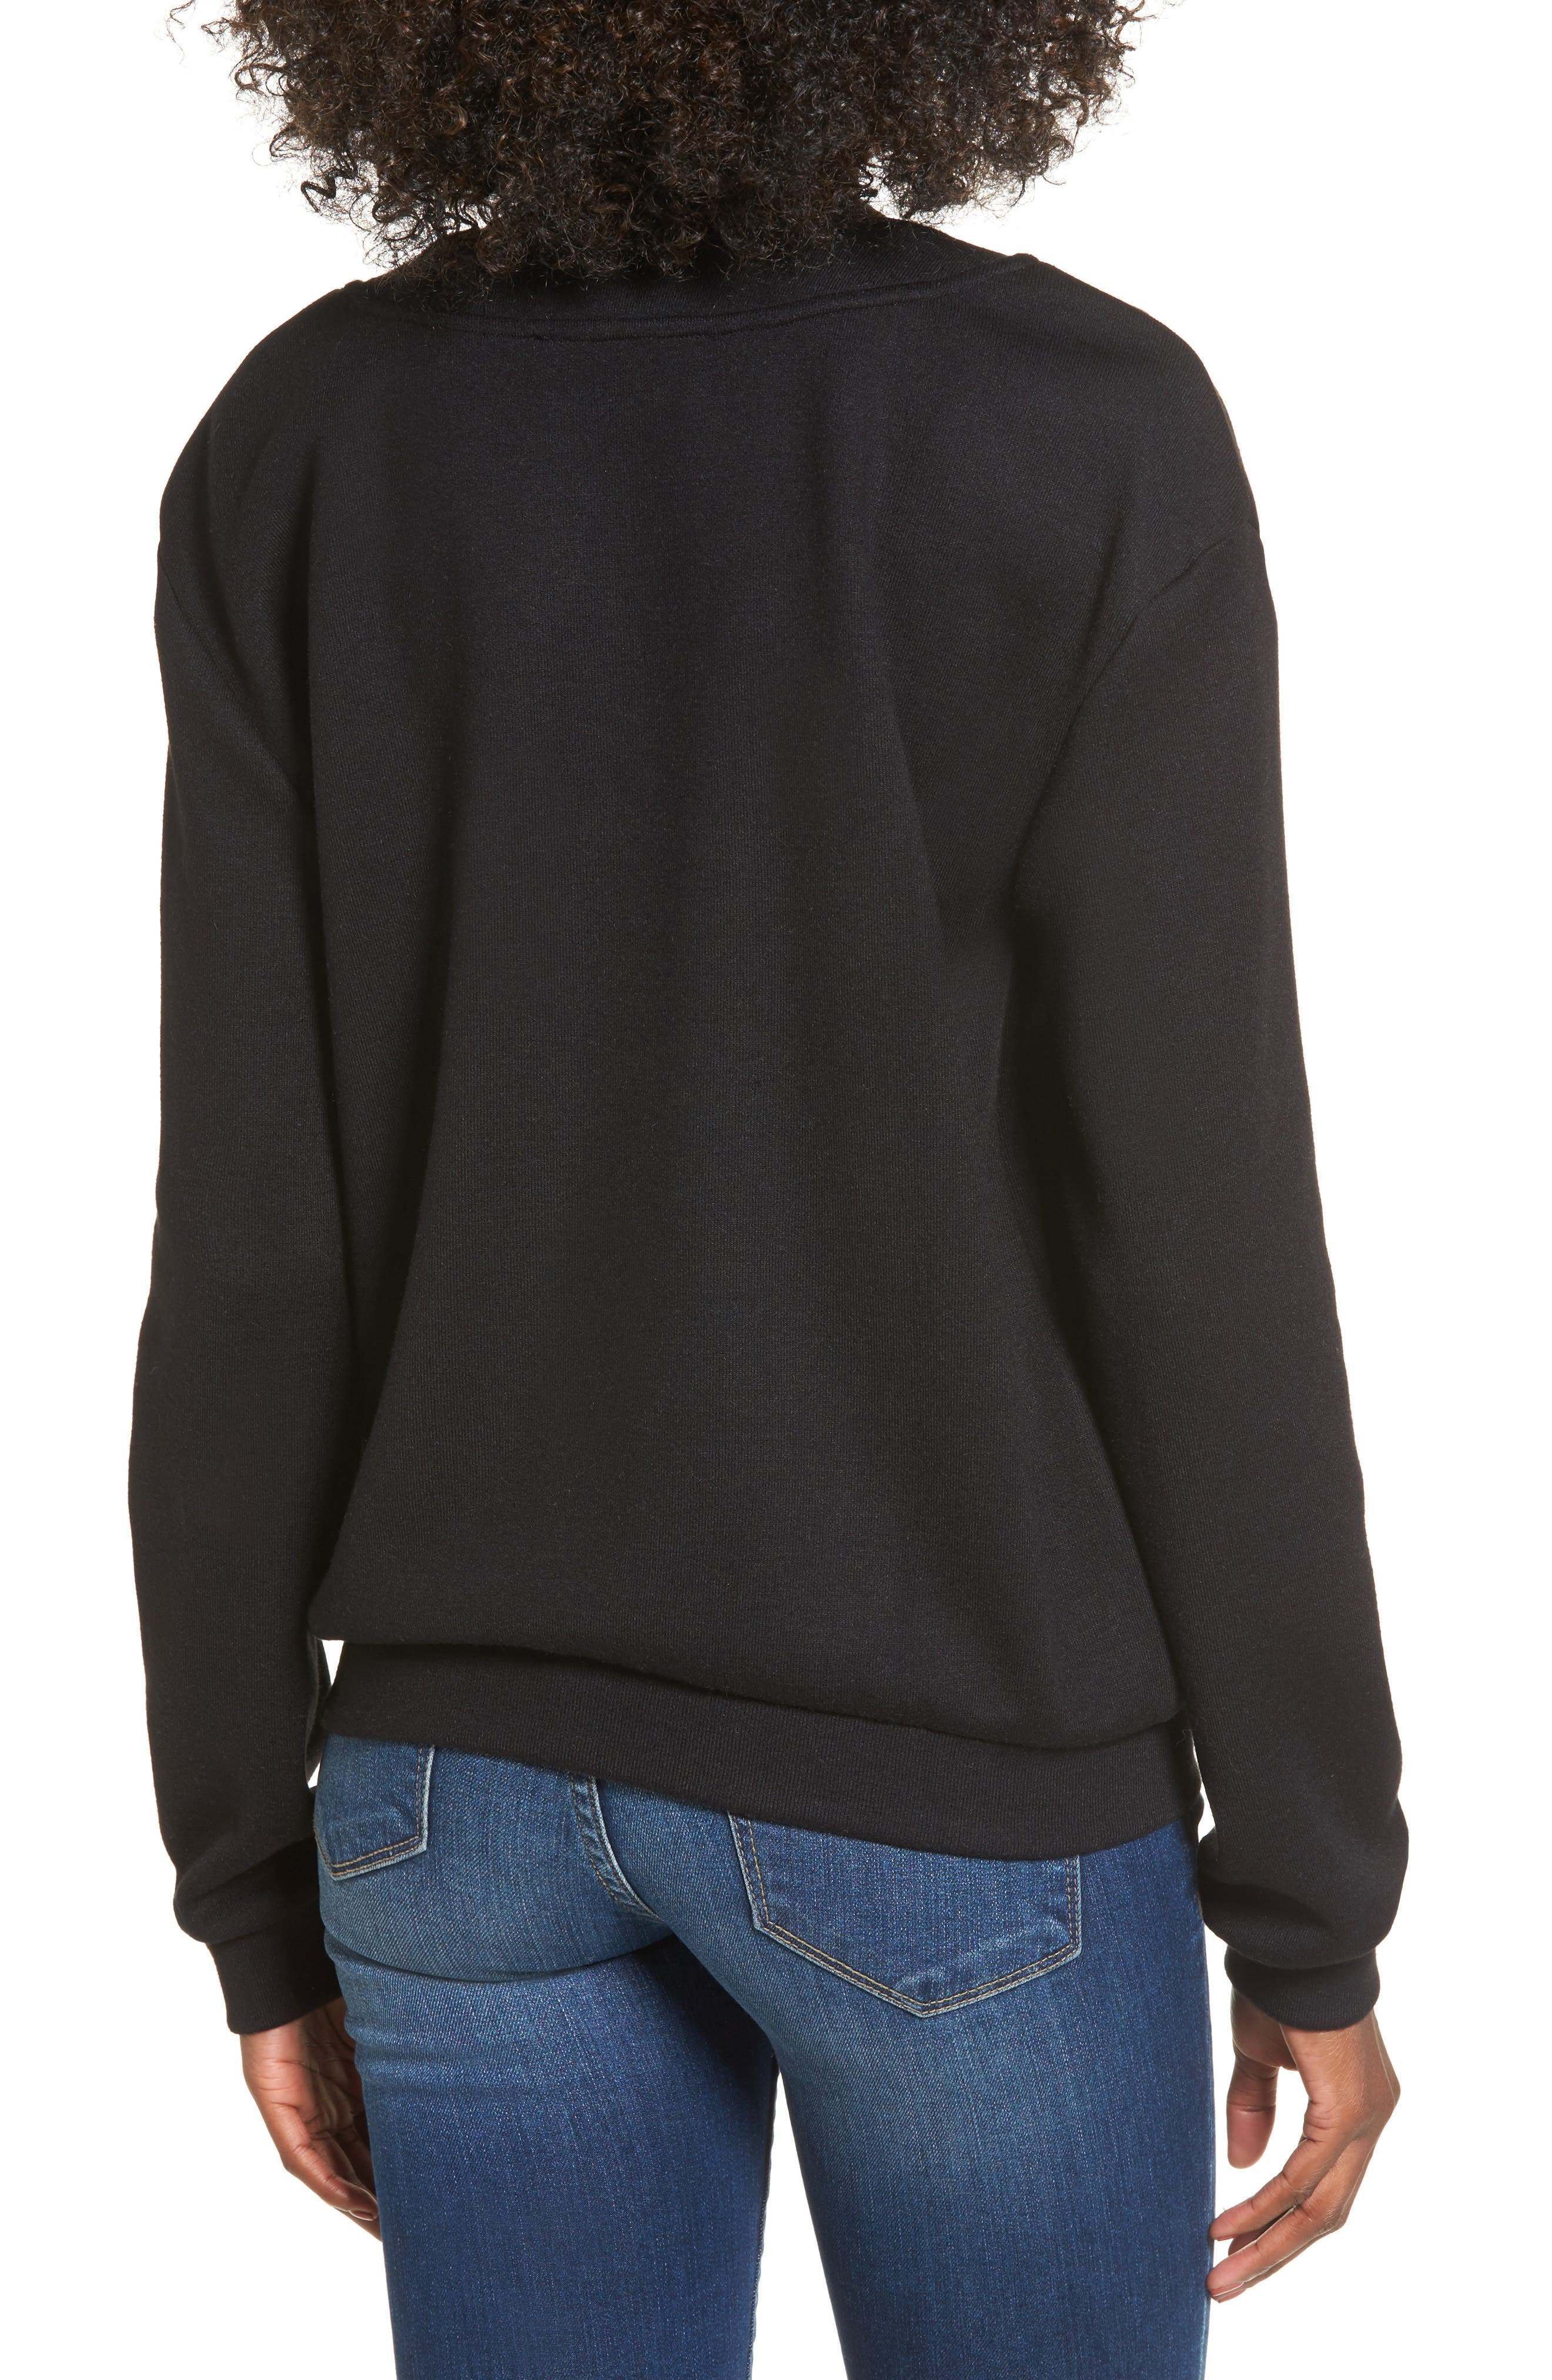 Alternate Image 2  - J.O.A. Lace-Up Sweatshirt